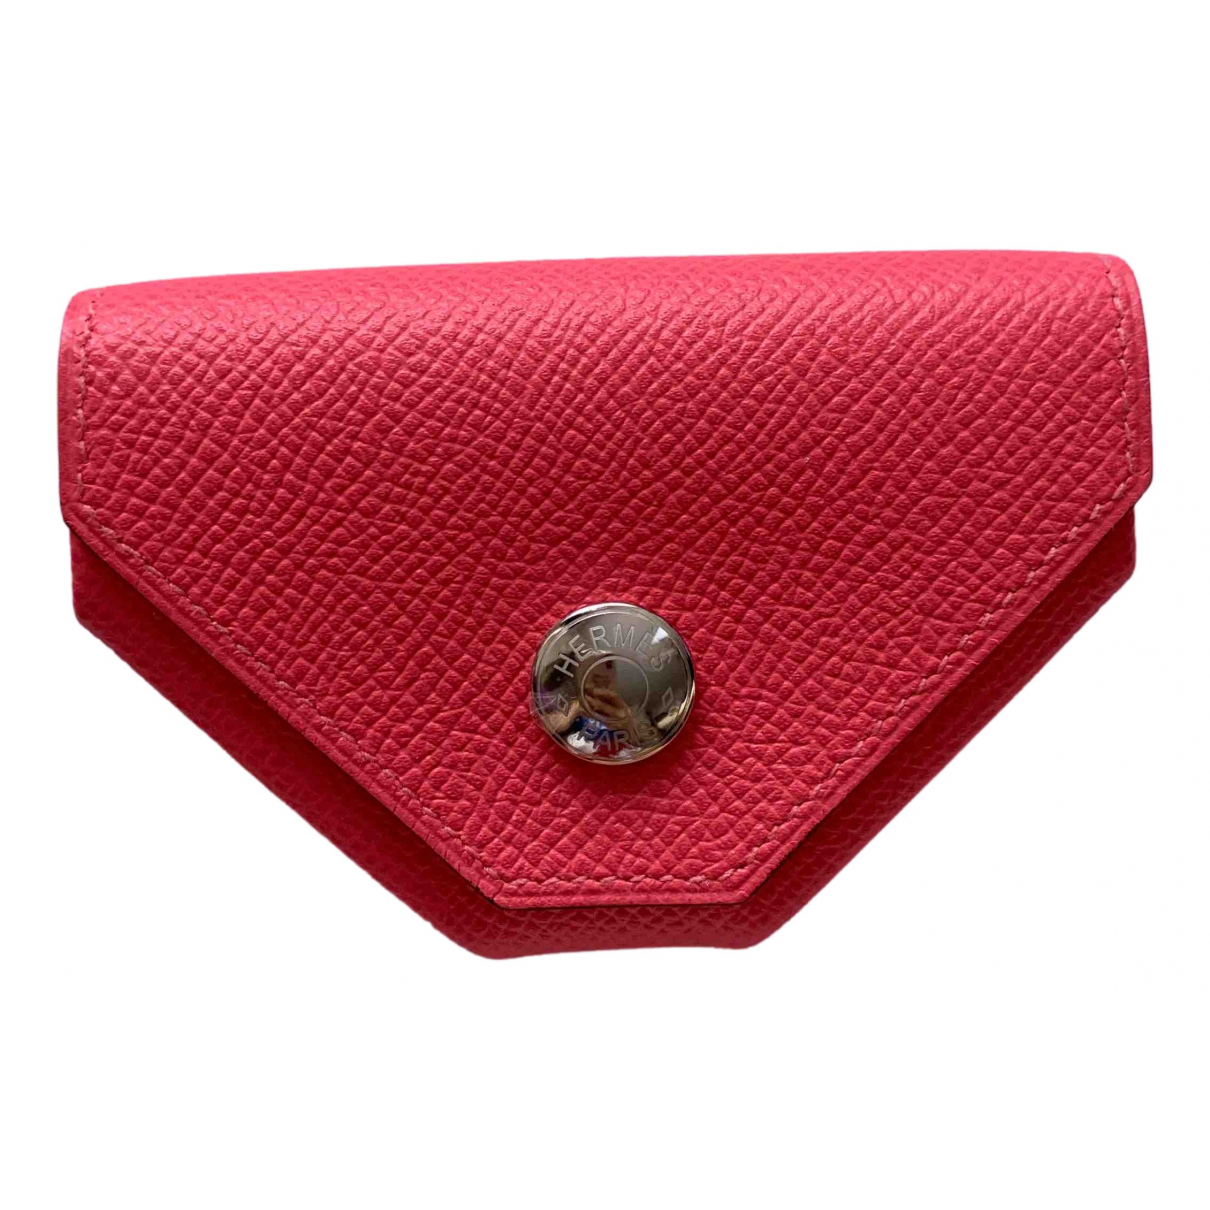 Hermès N Pink Leather Purses, wallet & cases for Women N